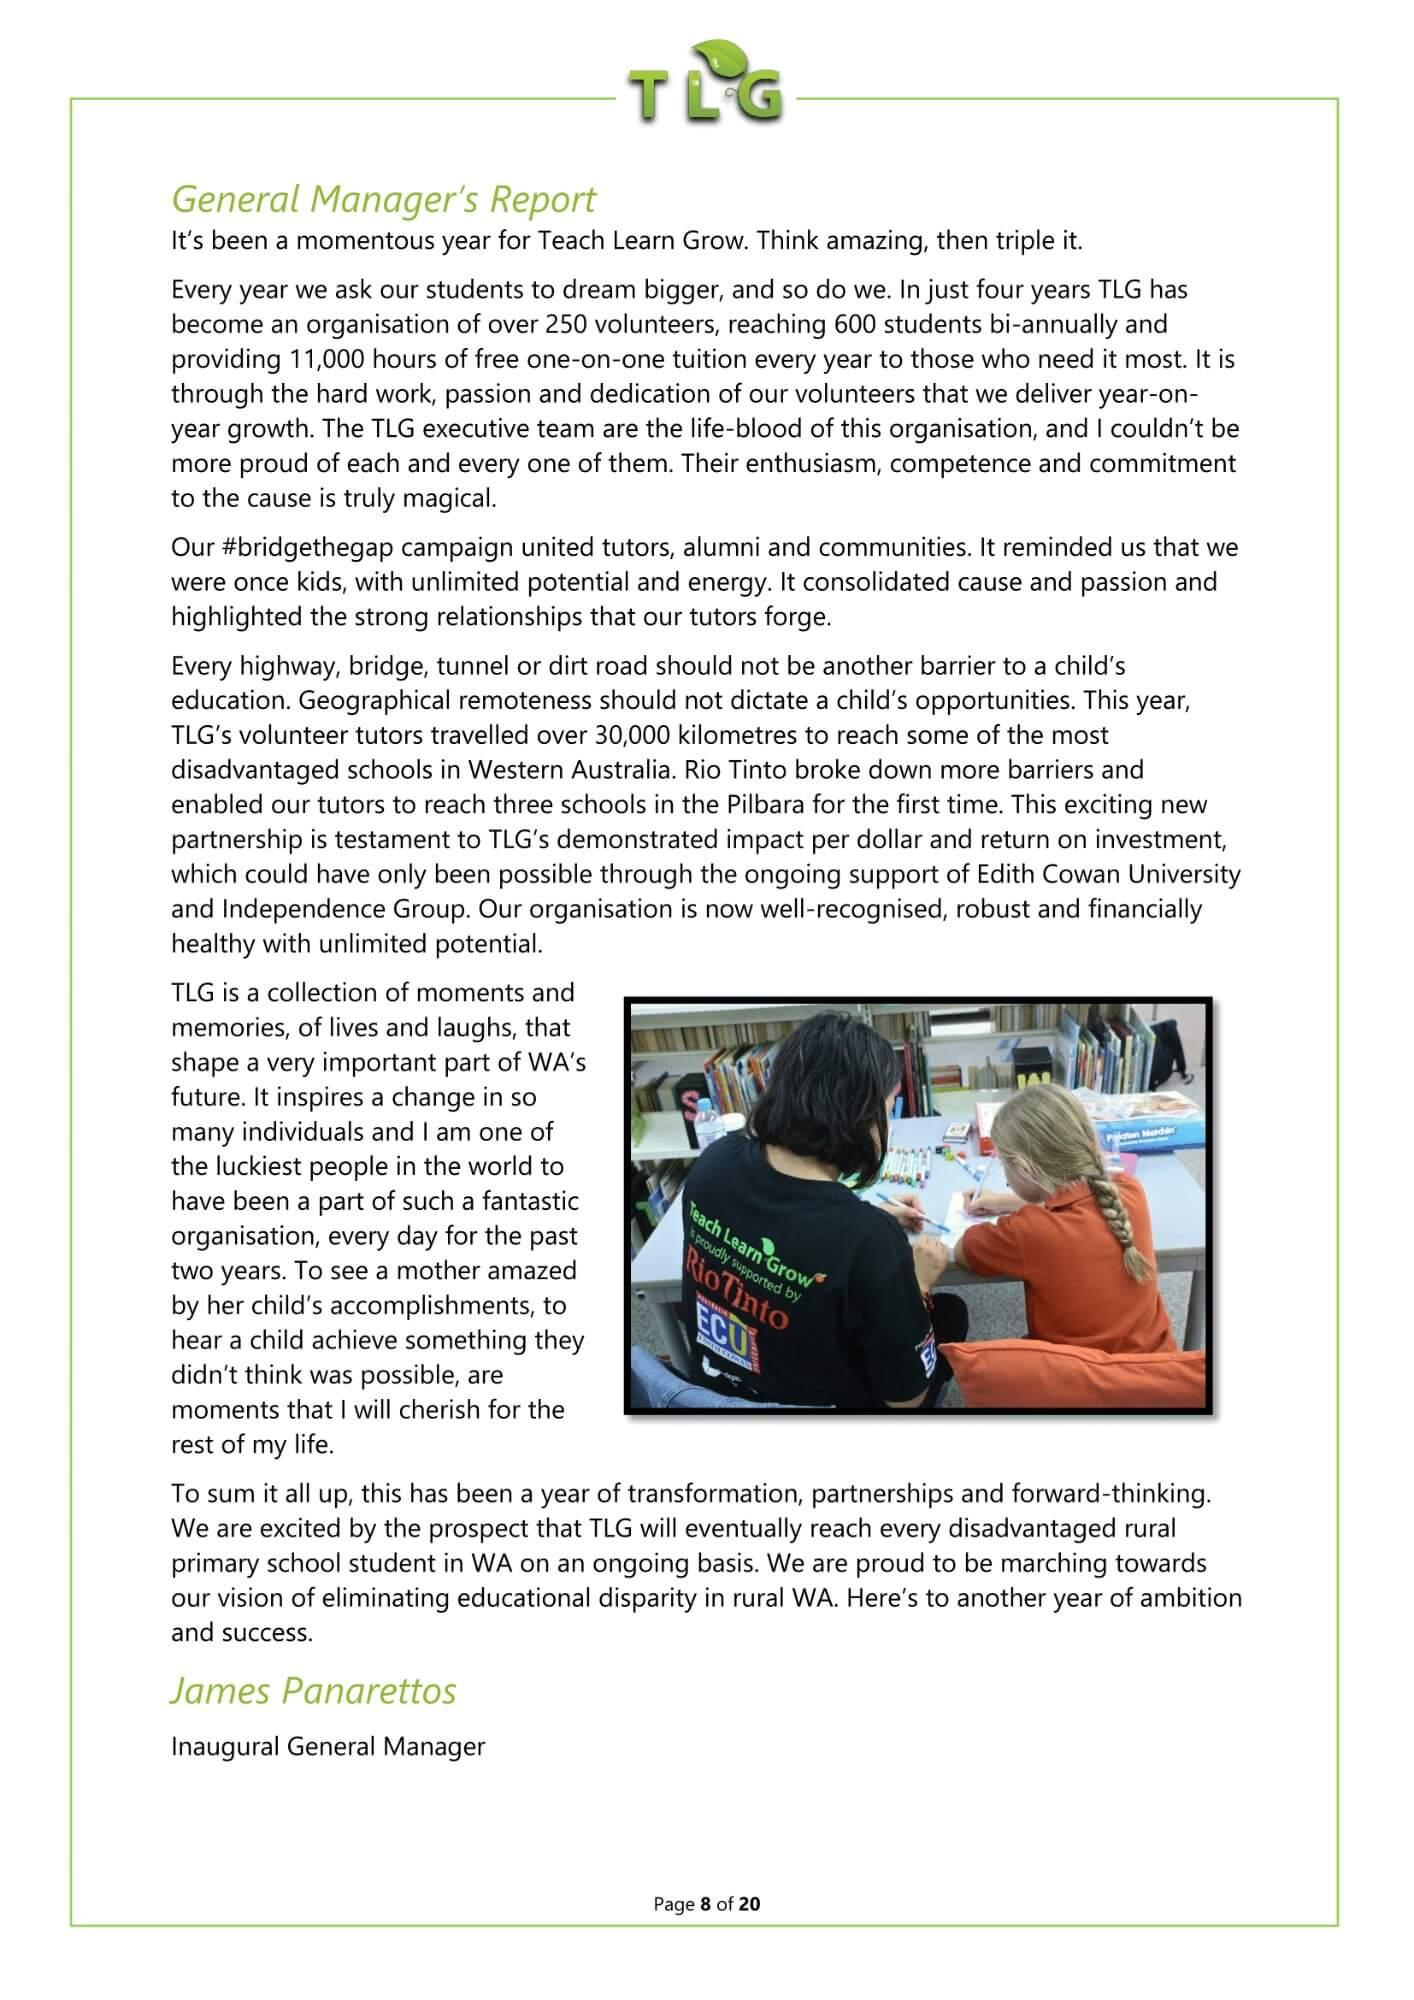 tlg-annual-report-FY14-08.jpg